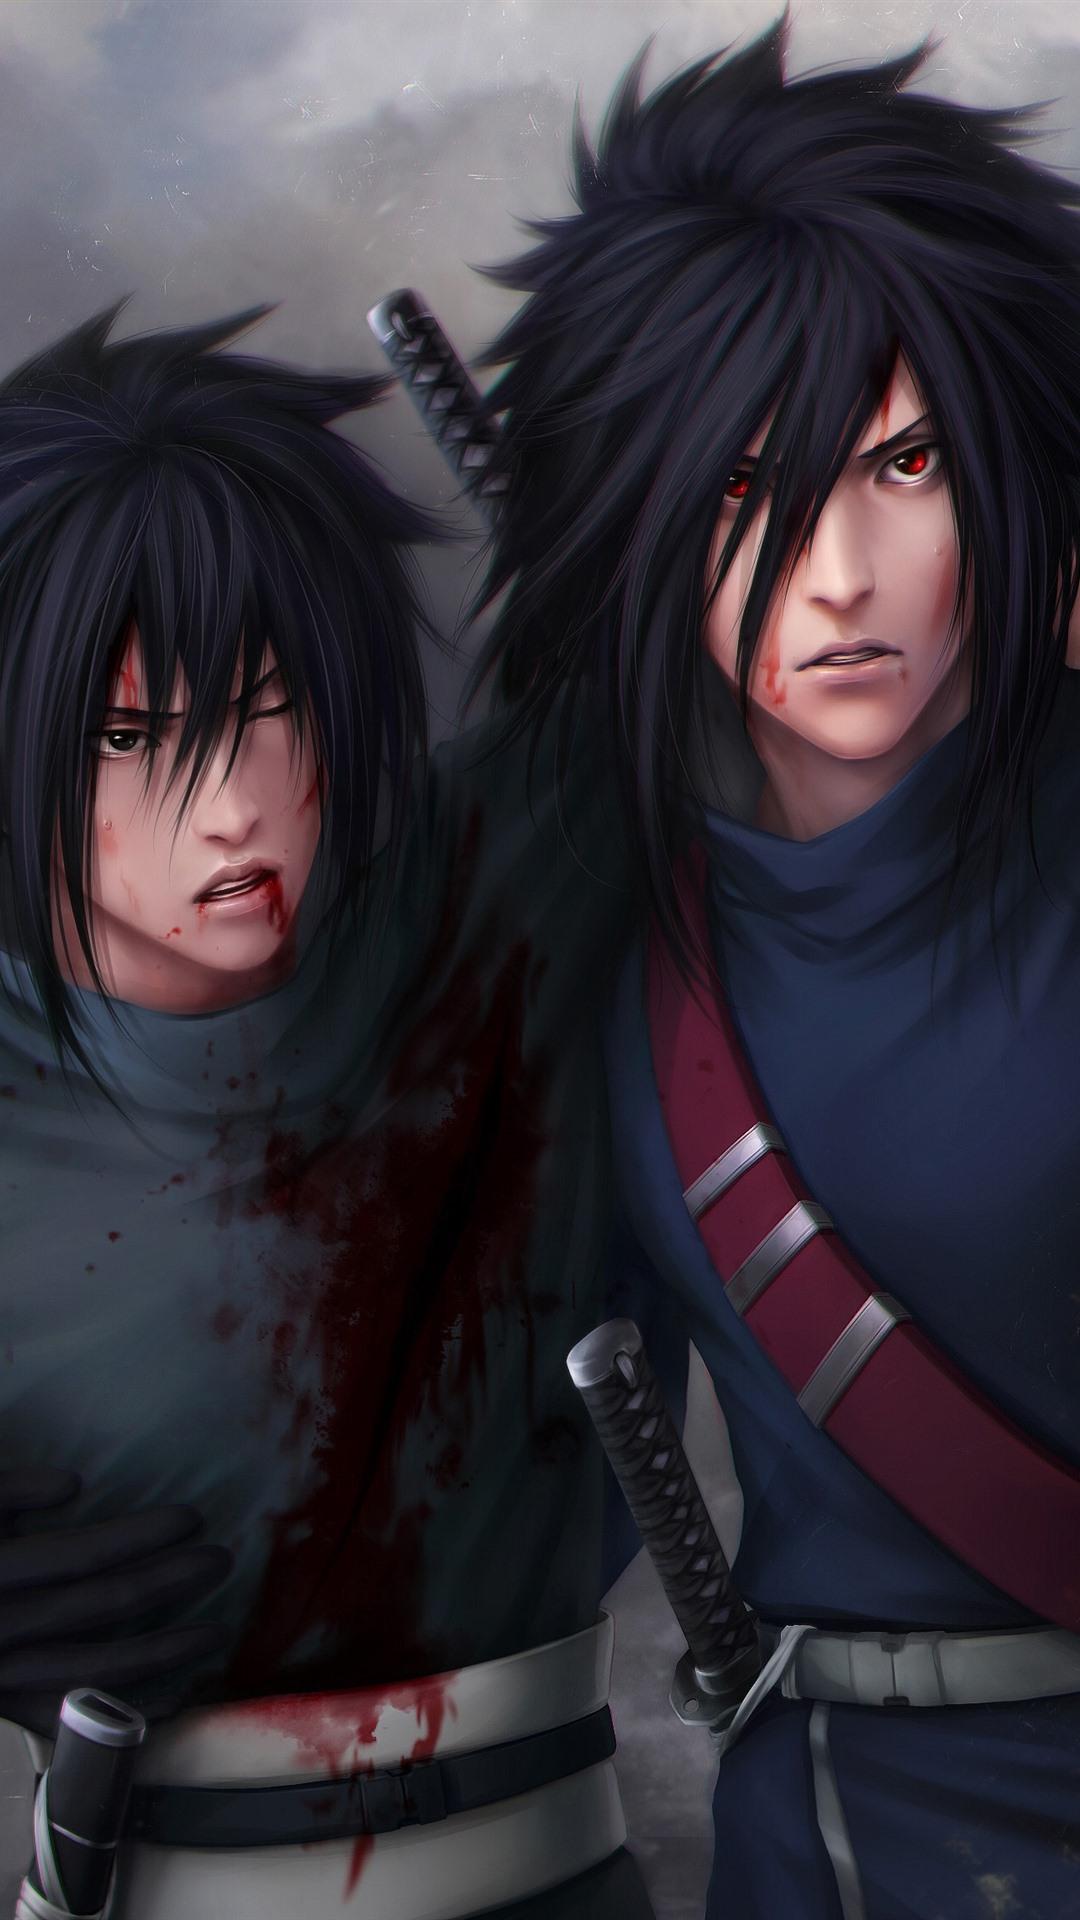 Naruto Zwei Anime Jungs 2880x1800 Hd Hintergrundbilder Hd